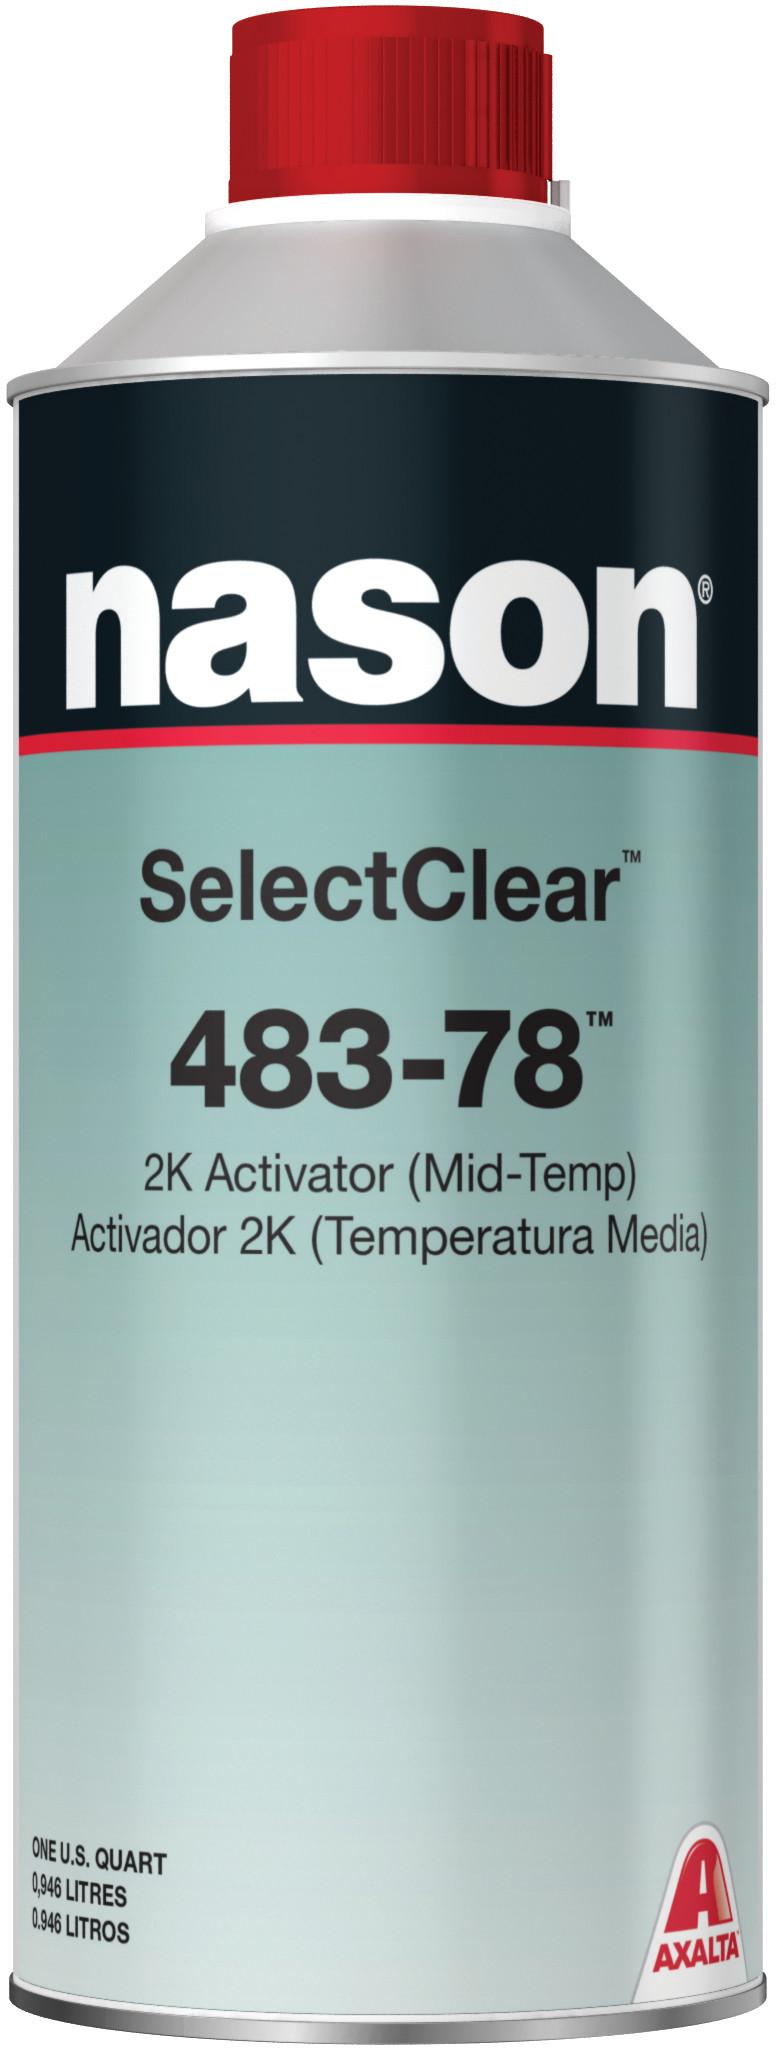 Axalta Nason Selectclear Activator Quart